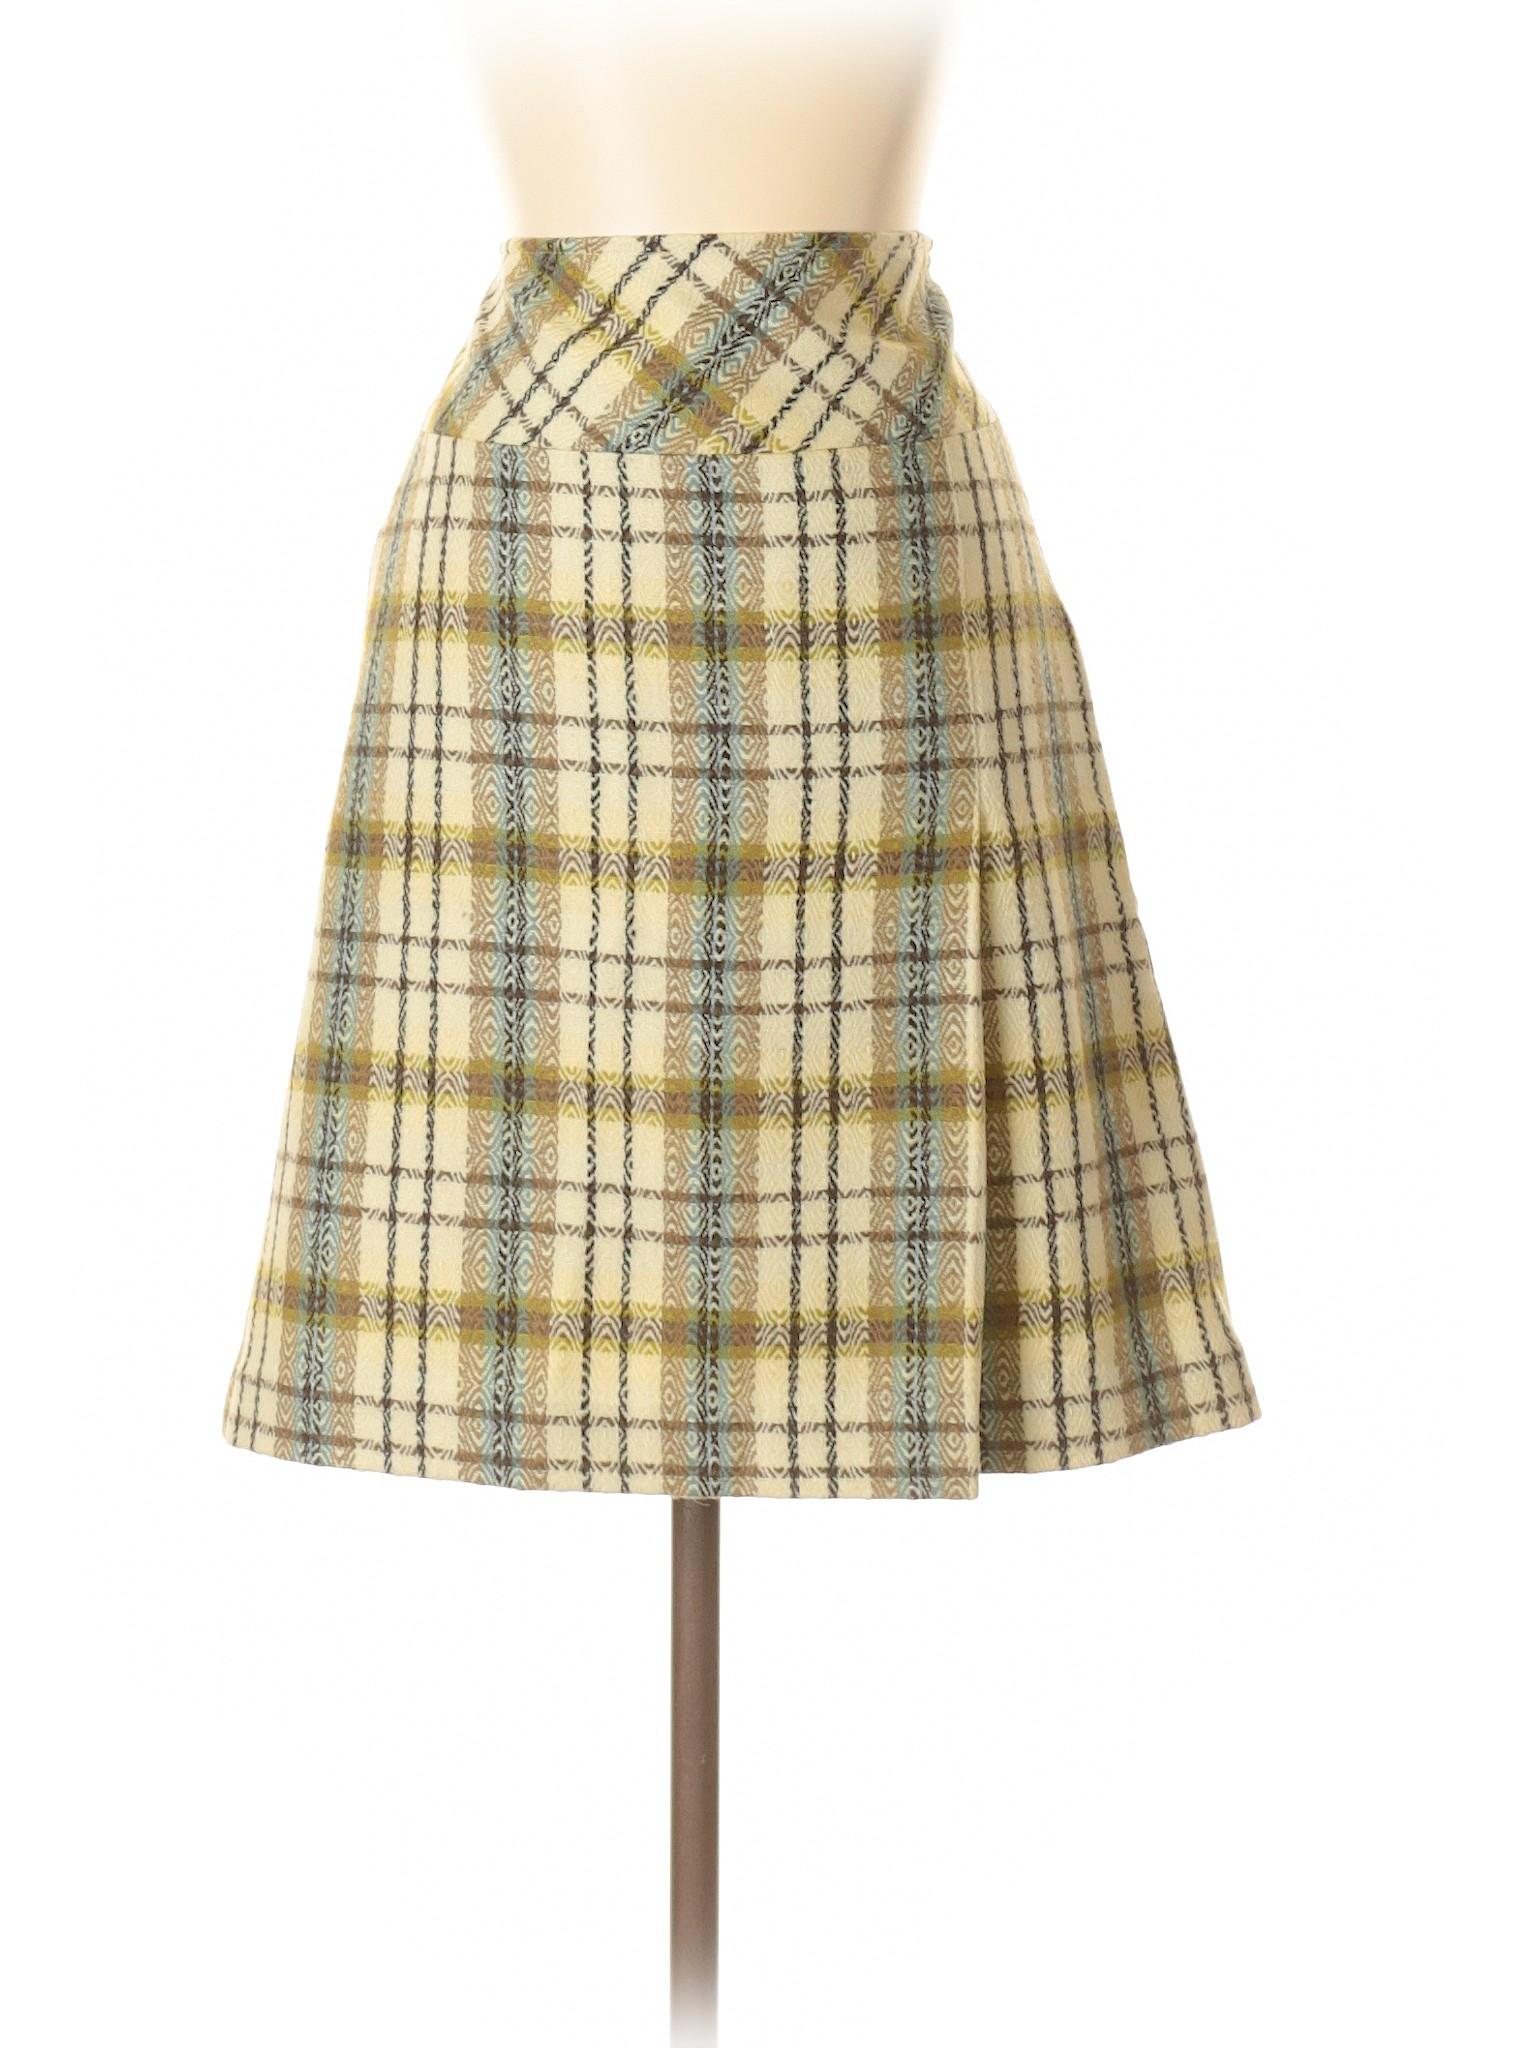 Skirt Boutique Wool Taylor LOFT Ann pgqvgfIwx